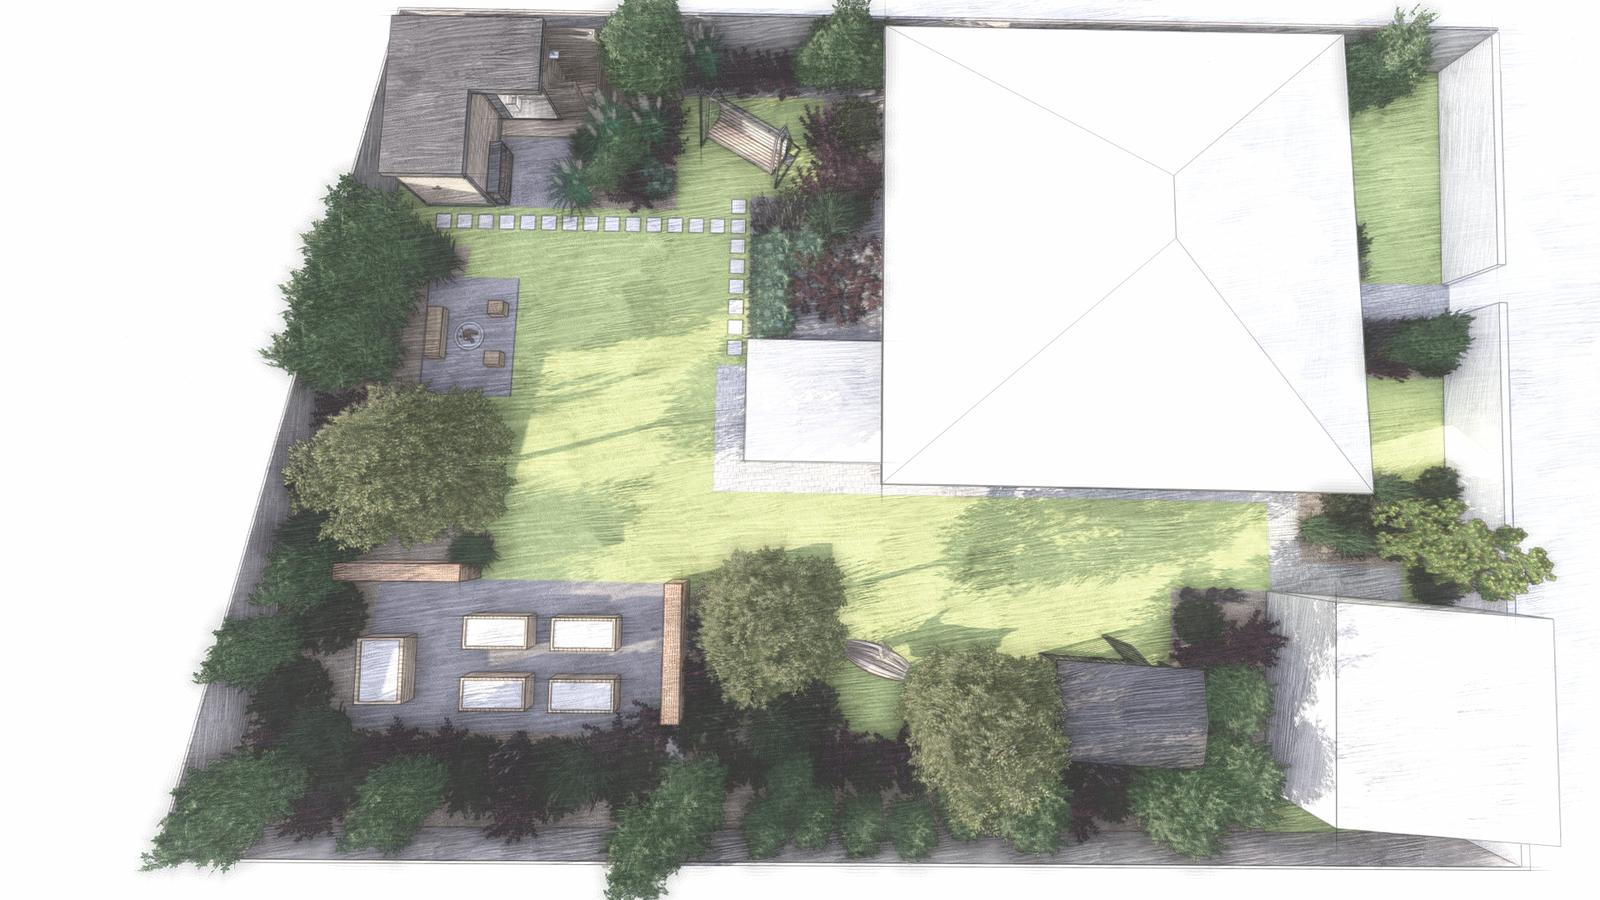 Návrh záhrady rodinného domu - Obrázok č. 16